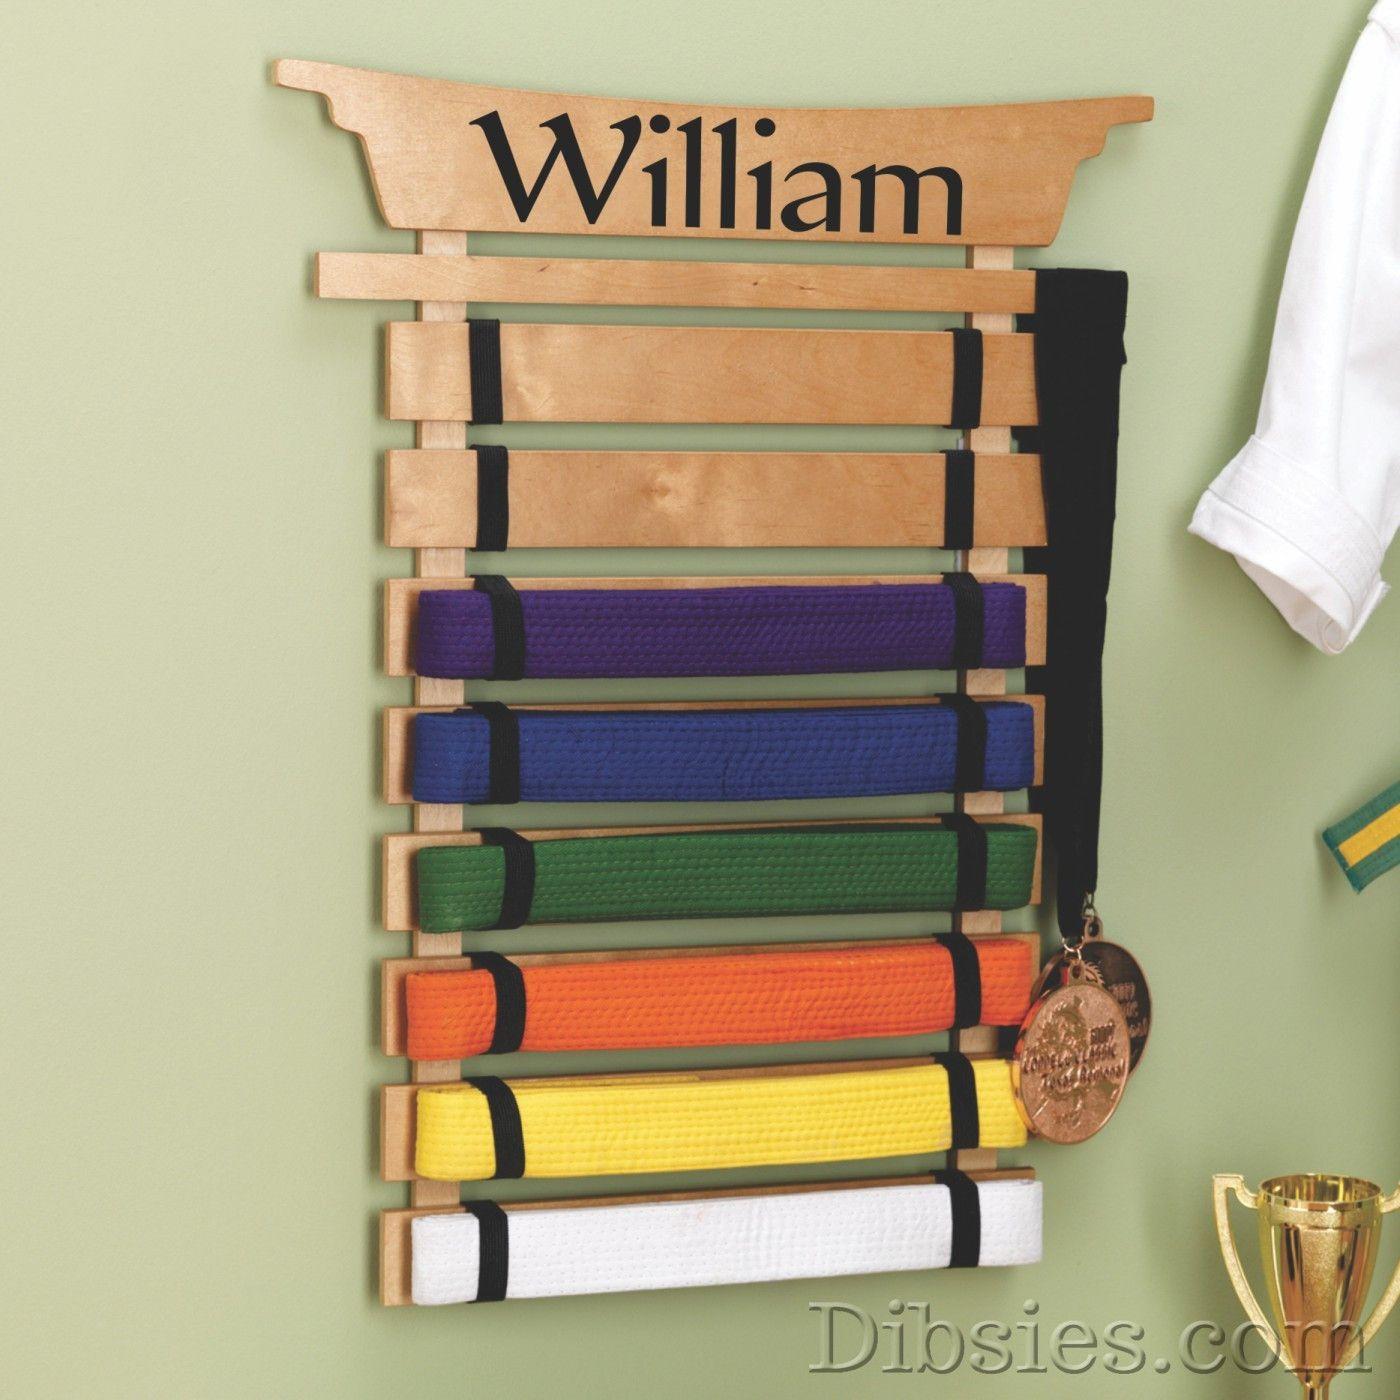 Karate belt display ideas - Personalized Karate Belt Display